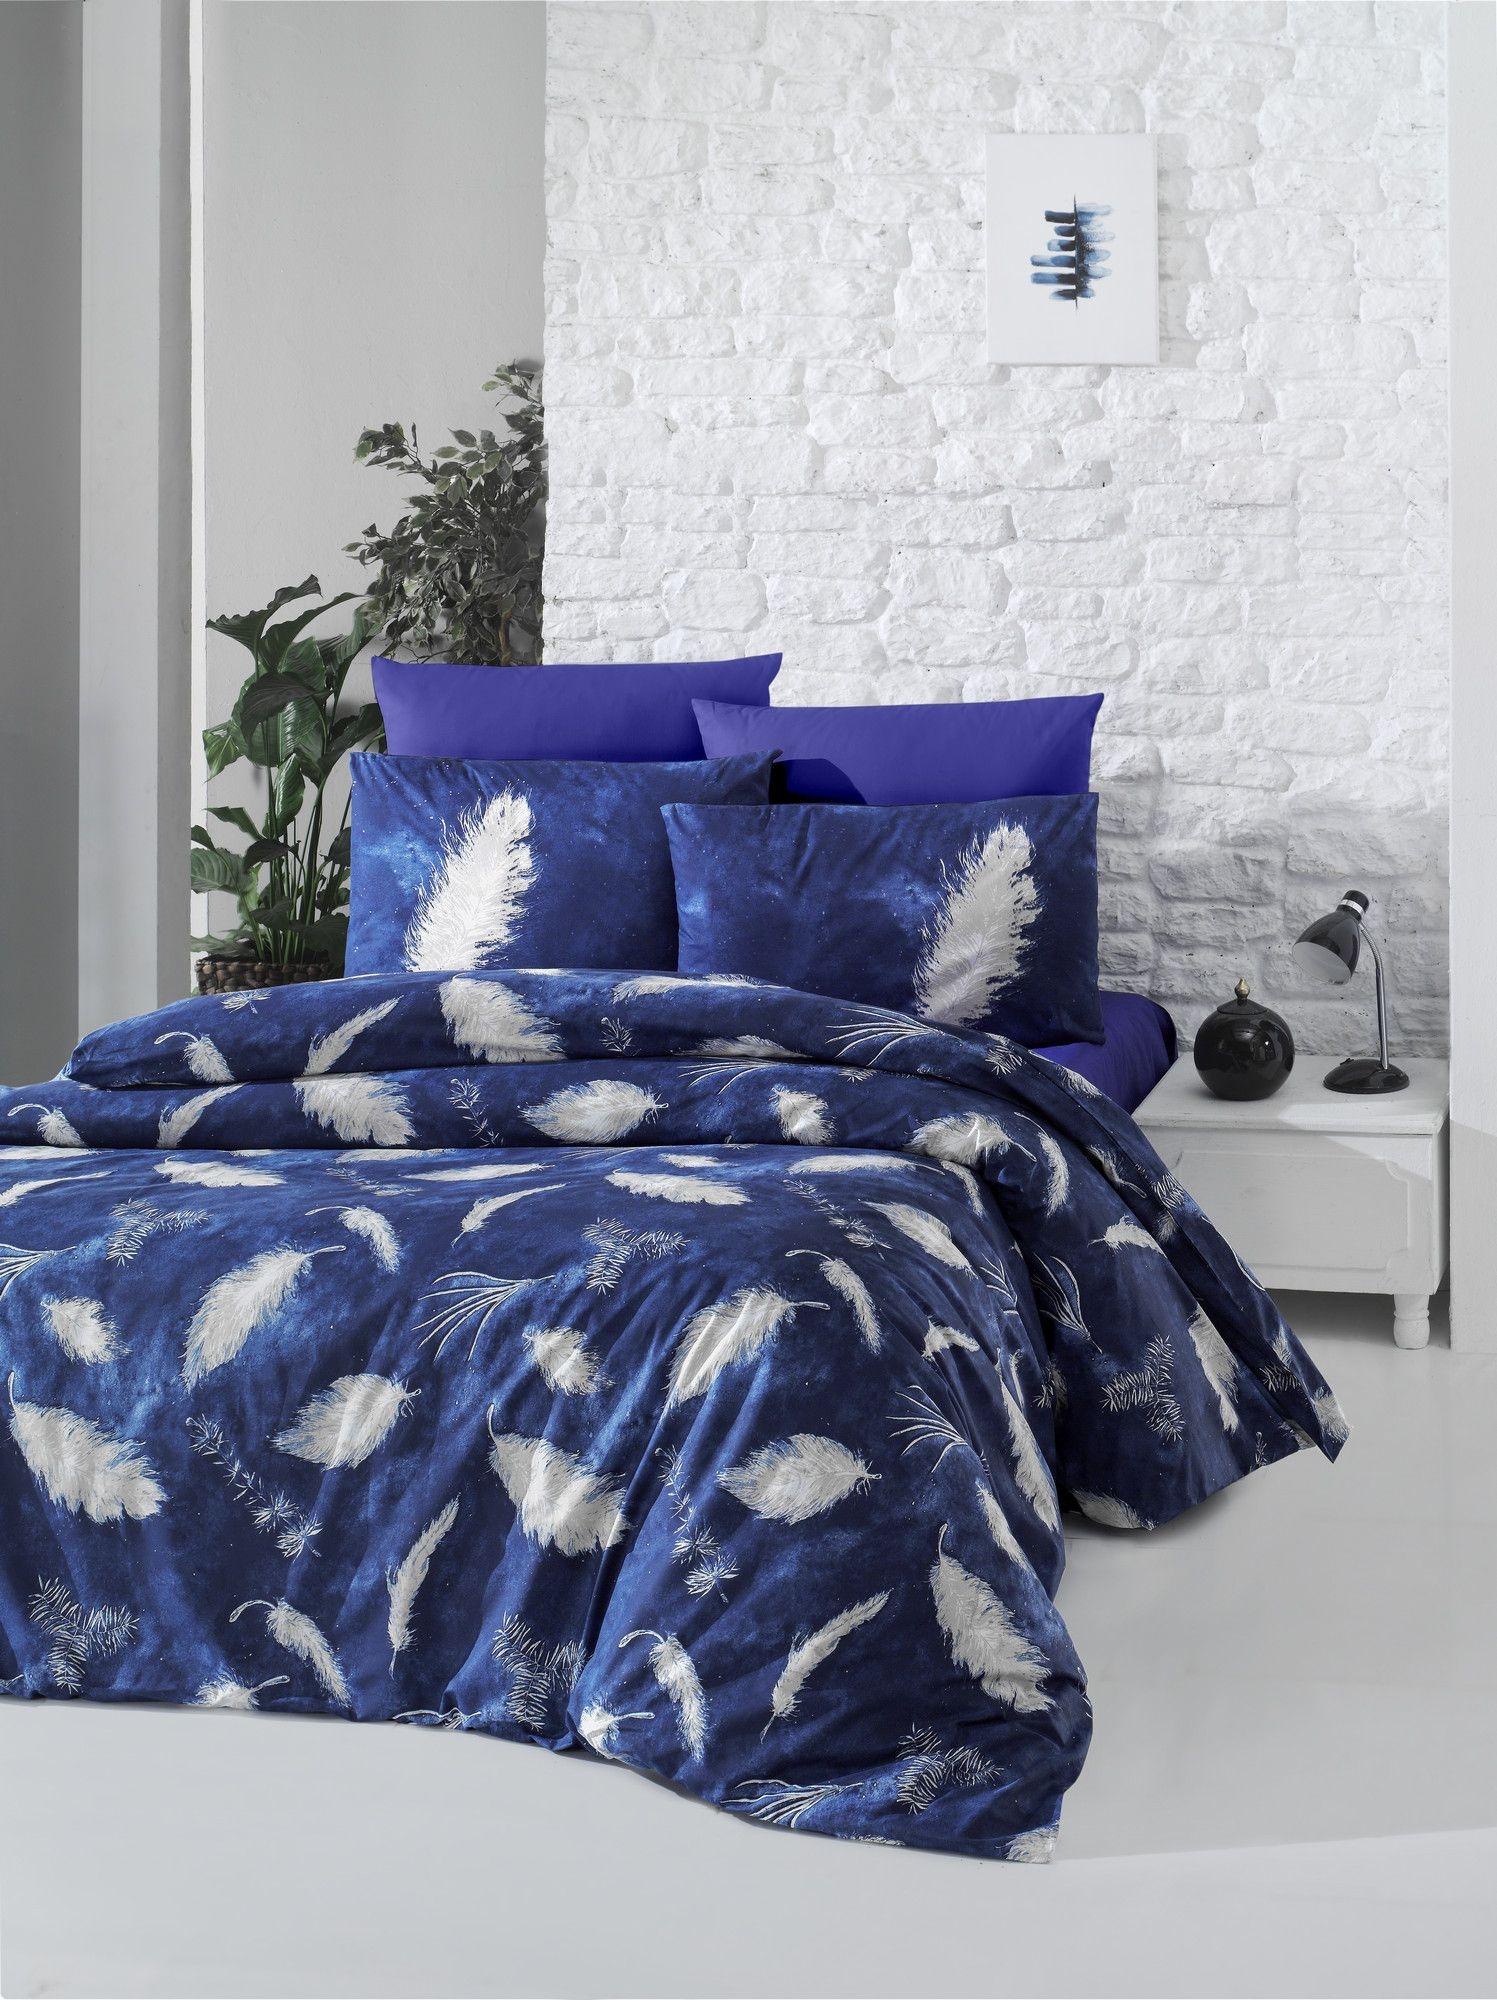 Lenjerie de pat din bumbac Ranforce, Feather Bleumarin / Alb, 200 x 220 cm imagine